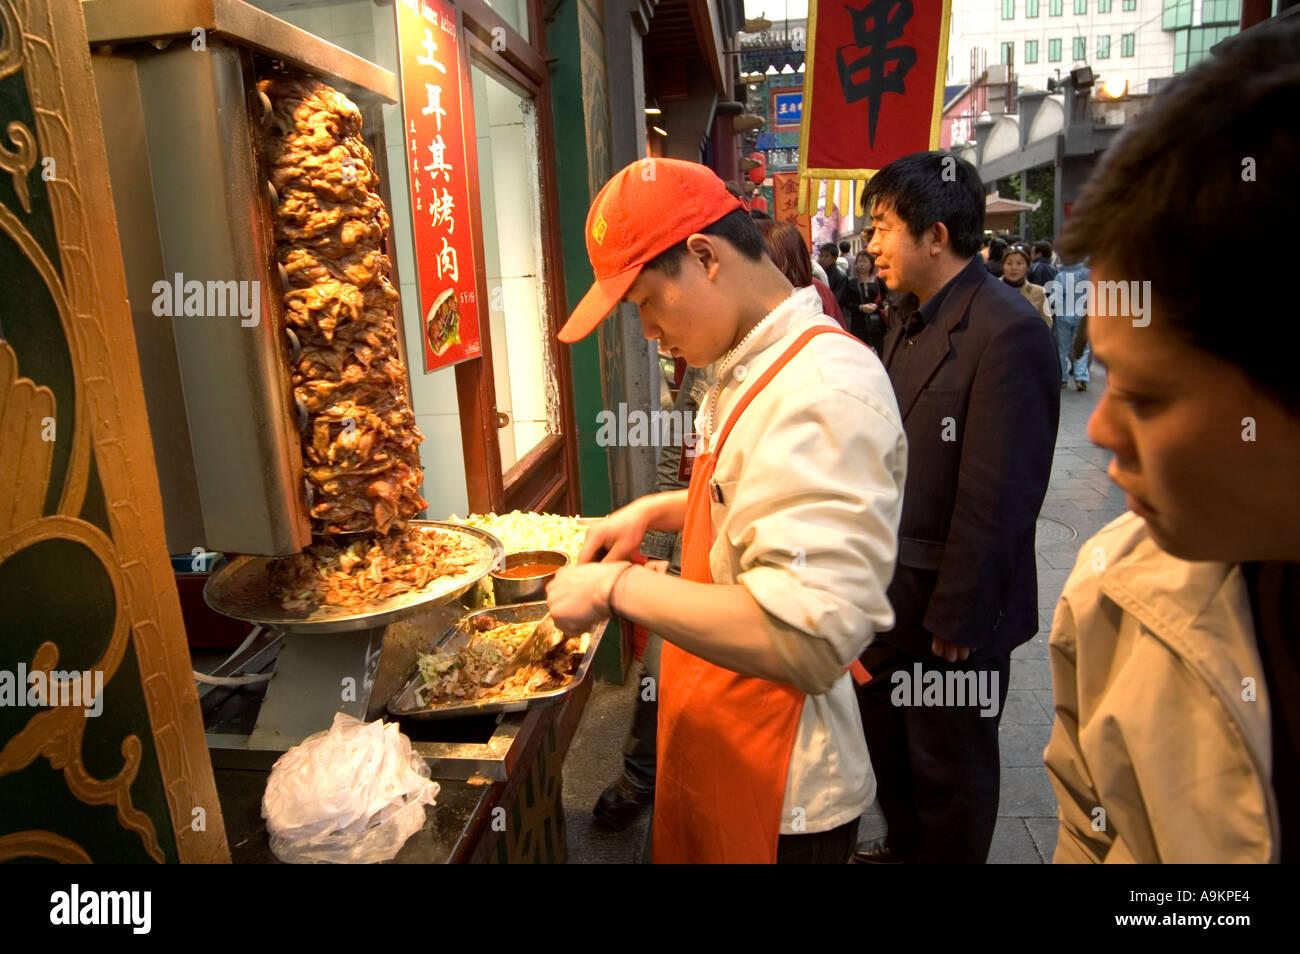 CHINESE KEBAB FAST FOOD STALL IN SNACK STREET BESIDE WANGFUJING SHOPPING AREA BEIJING CHINA - Stock Image